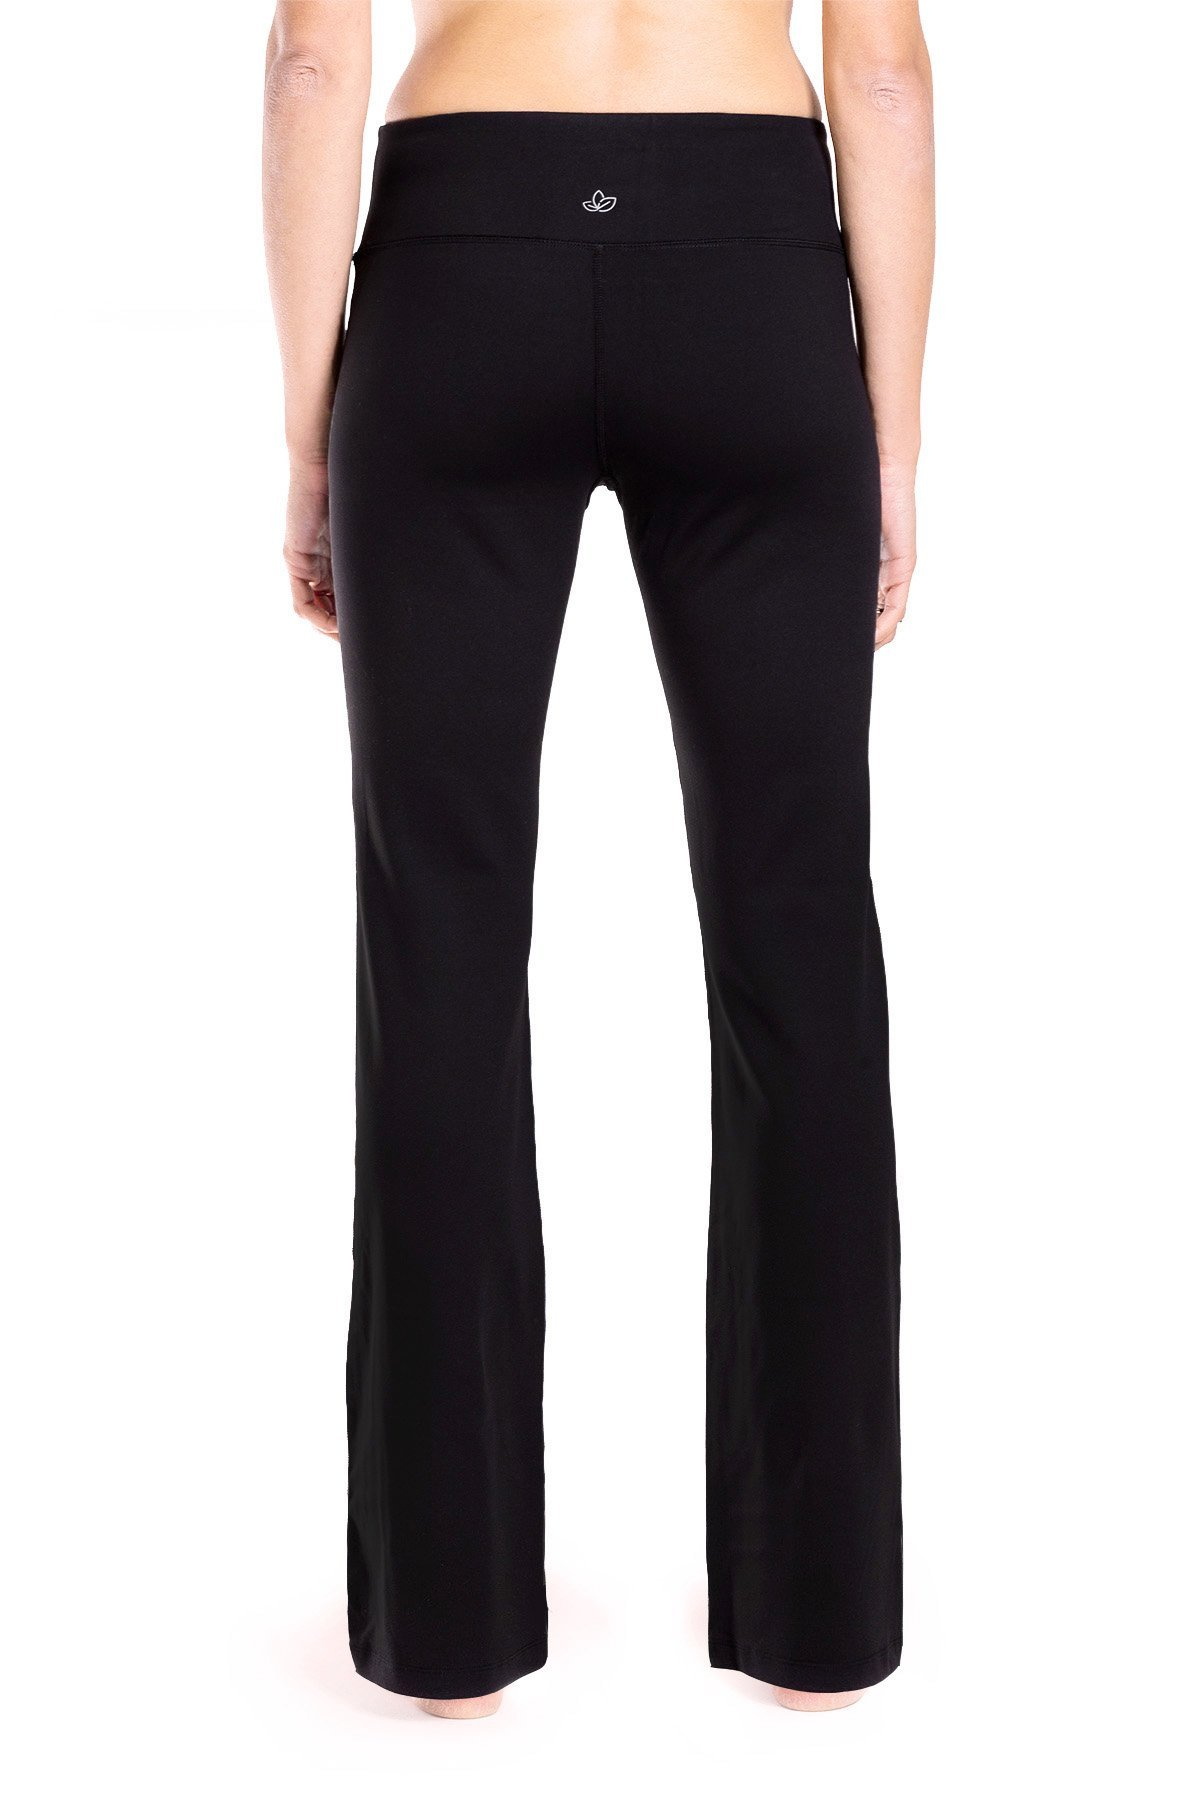 Yogipace 27''/28''/29''/30''/31''/32''/33''/35''/37'' Inseam,Petite/Regular/Tall, Women's Bootcut Yoga Pants Long Workout Pants, 28'', Black Size XS by Yogipace (Image #5)